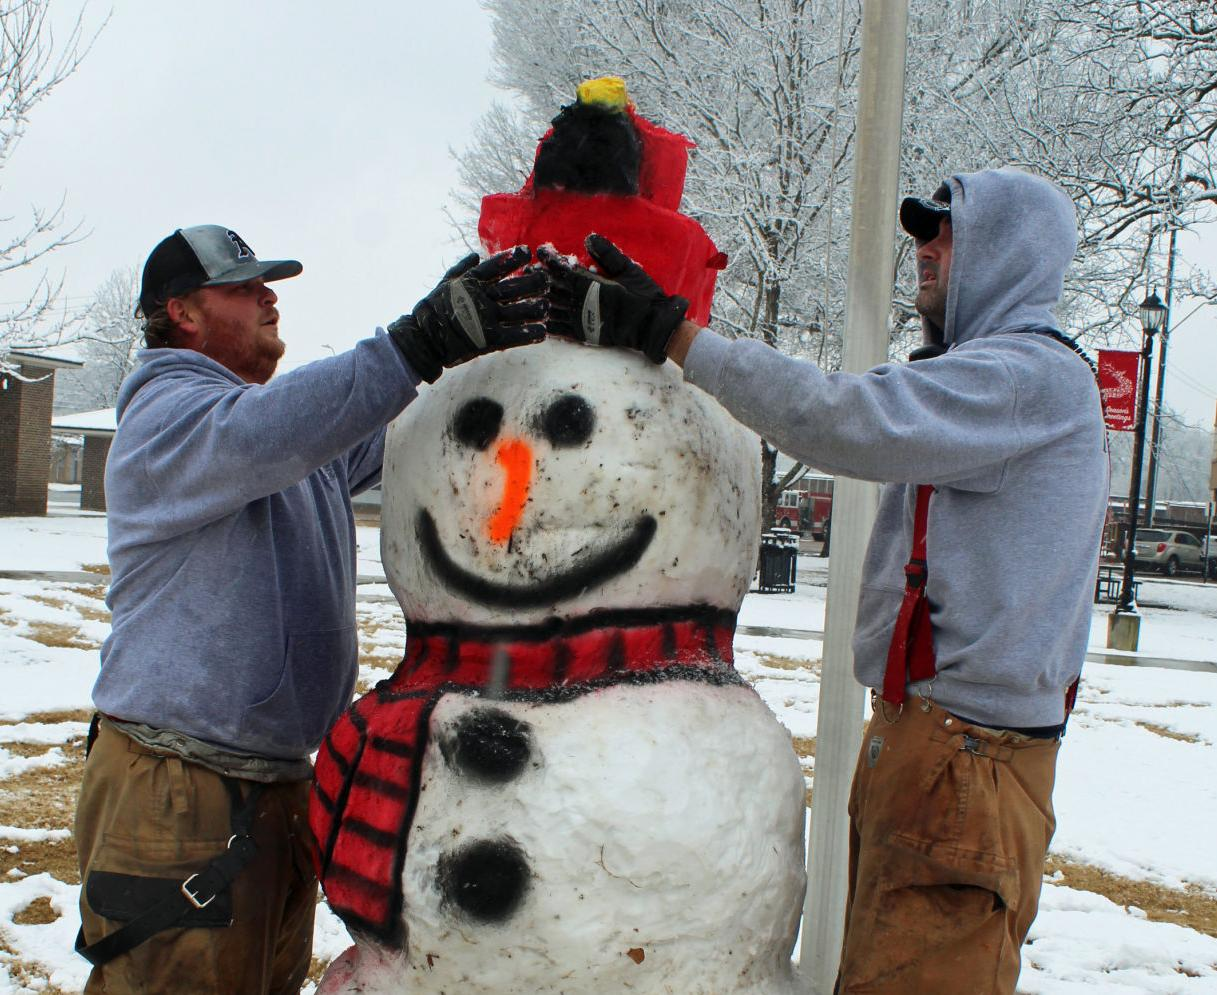 mcj-2021-01-13-news-snow-amory-snowman